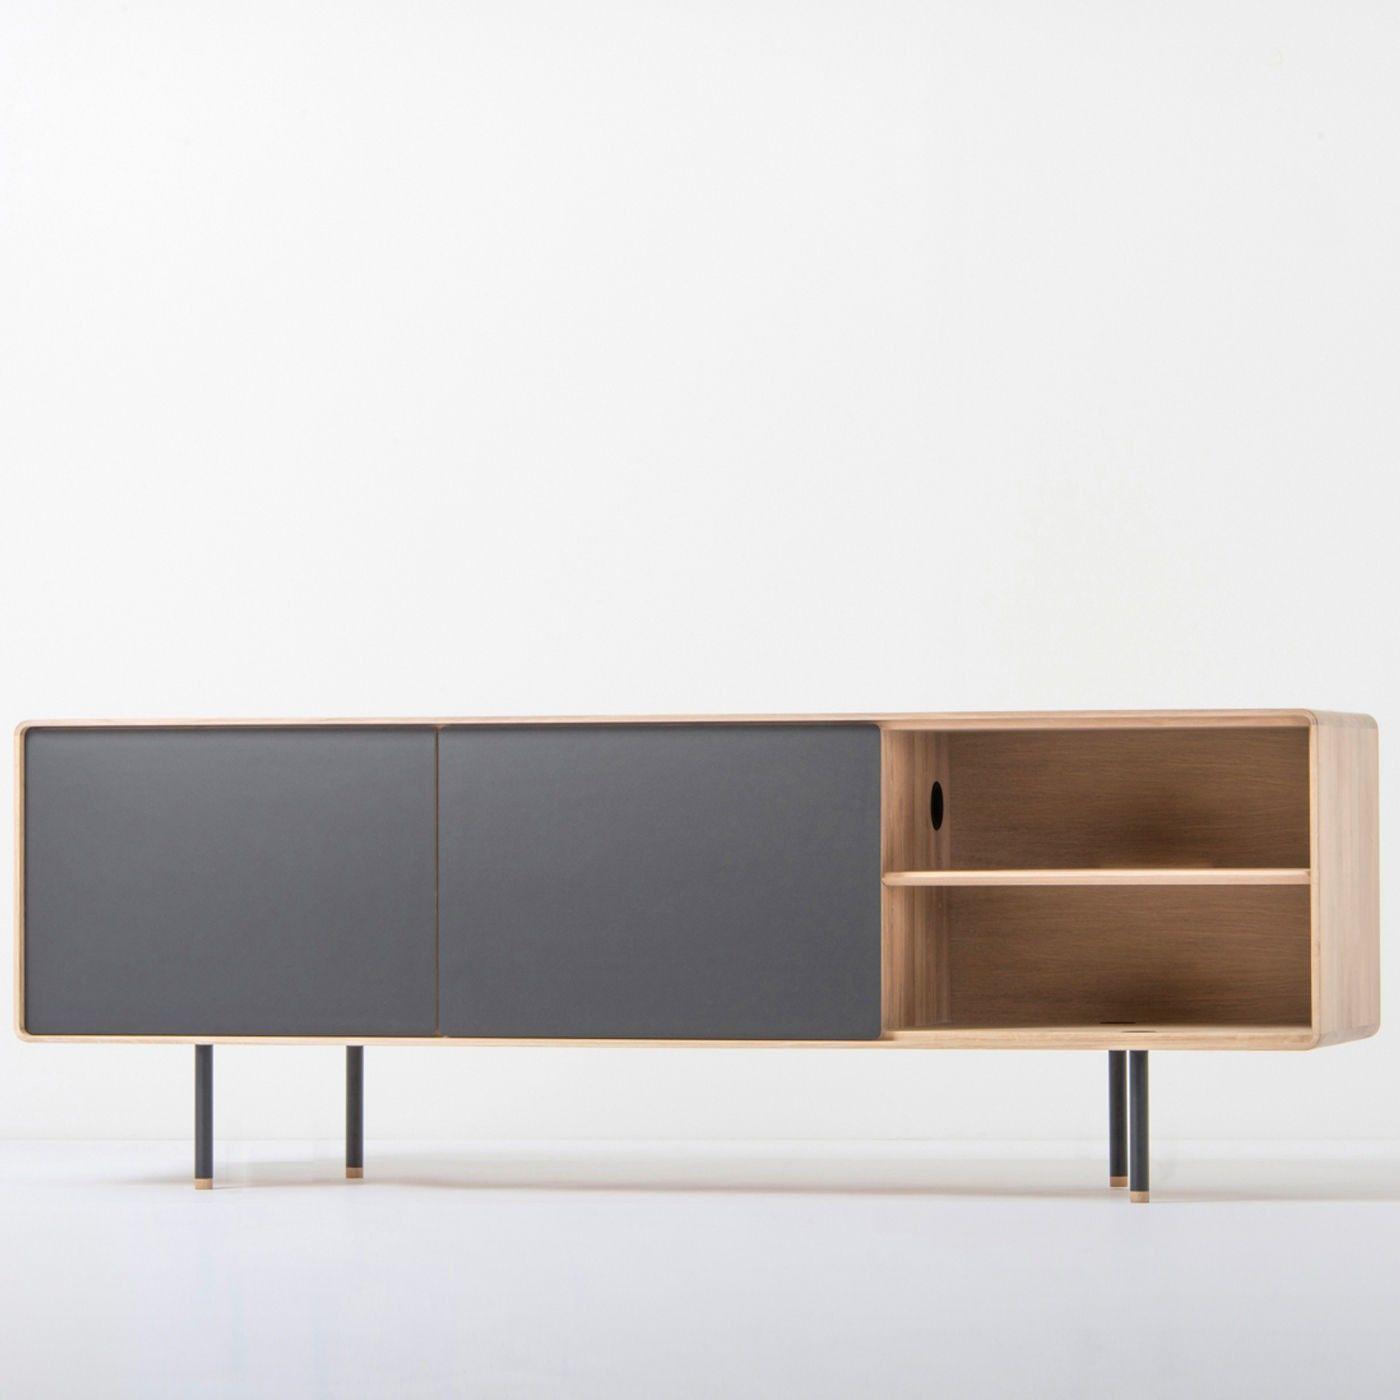 Tv Meubel White Wash.Fina Sideboard Scandinavisch Tv Meubel Interiors